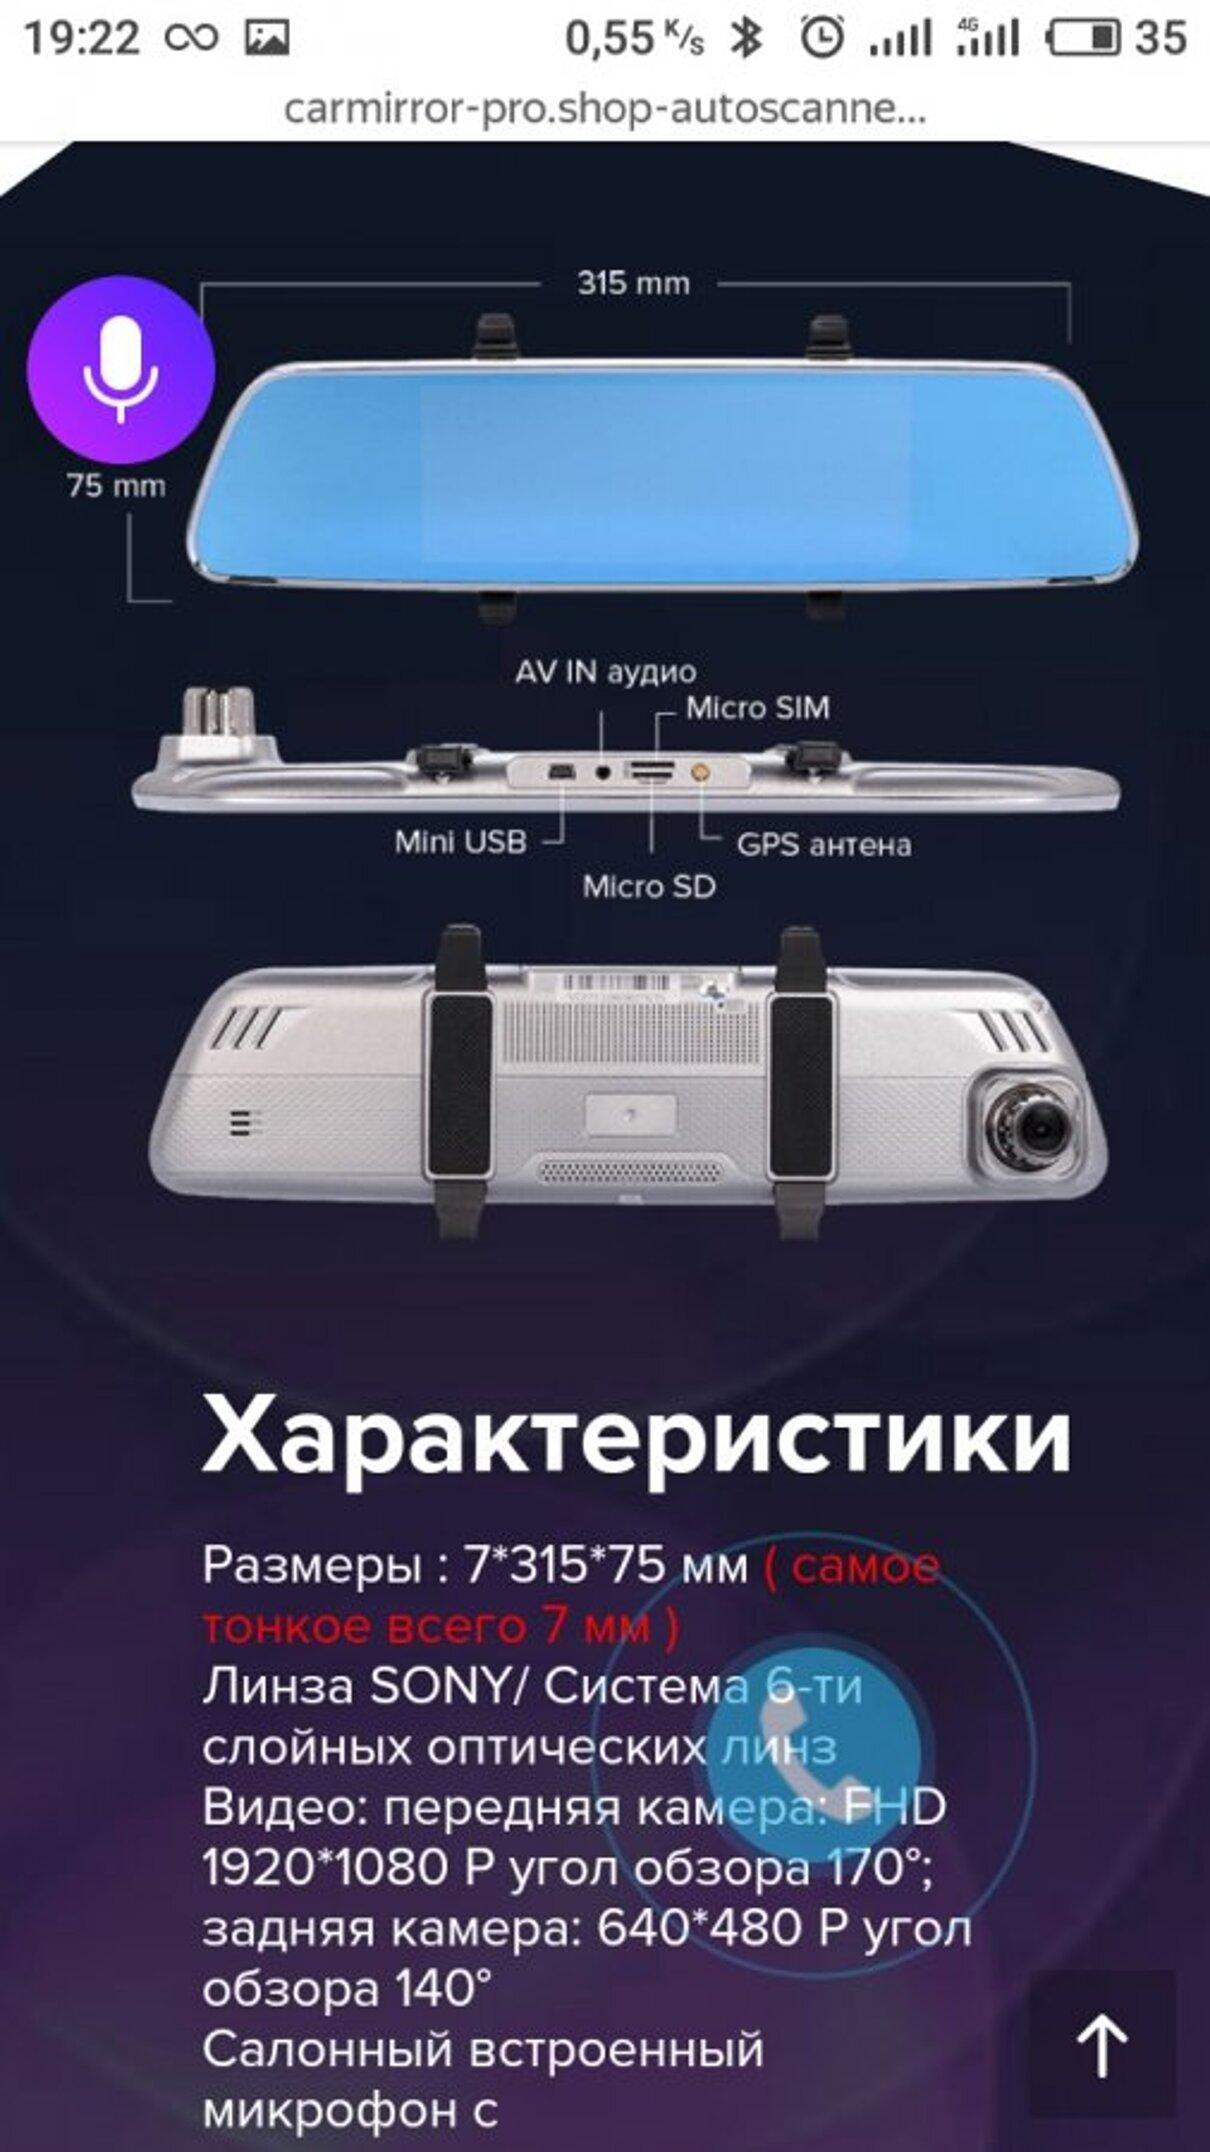 Жалоба-отзыв: Http://carmirror-pro.shop-autoscanner.ru/? utm_source=rsya&utm_medium=cpc&utm_term=sovets.net&utm_content=ob1-b1&utm_campaign=mrll-st-4&yclid=1170343904374180983 - Верните деньги или поменяйте товар